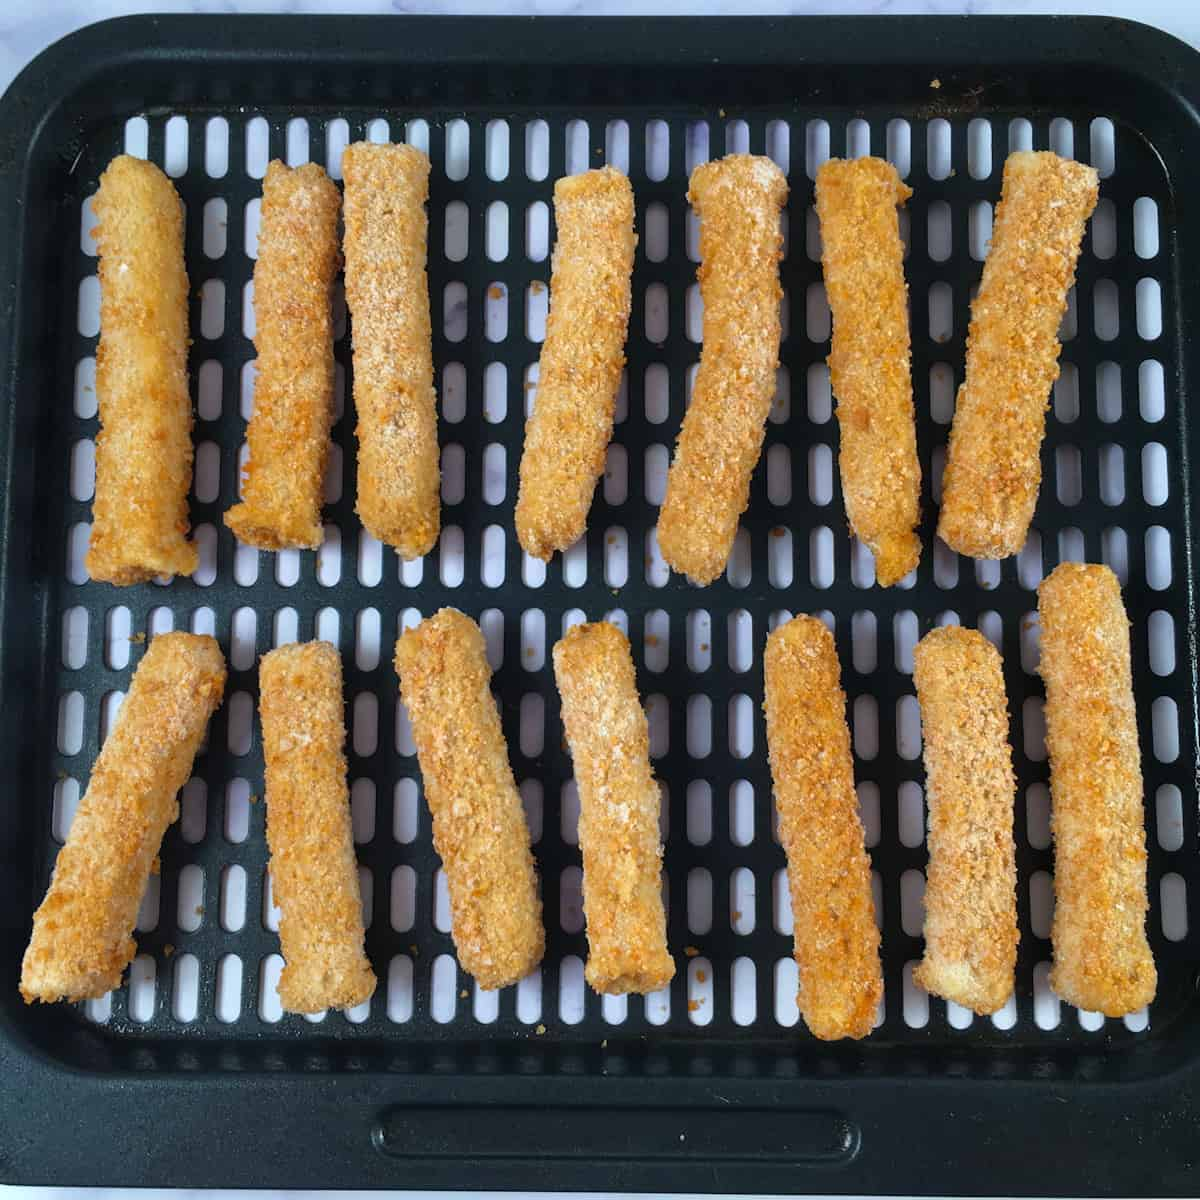 frozen chicken tenders air fryer tray